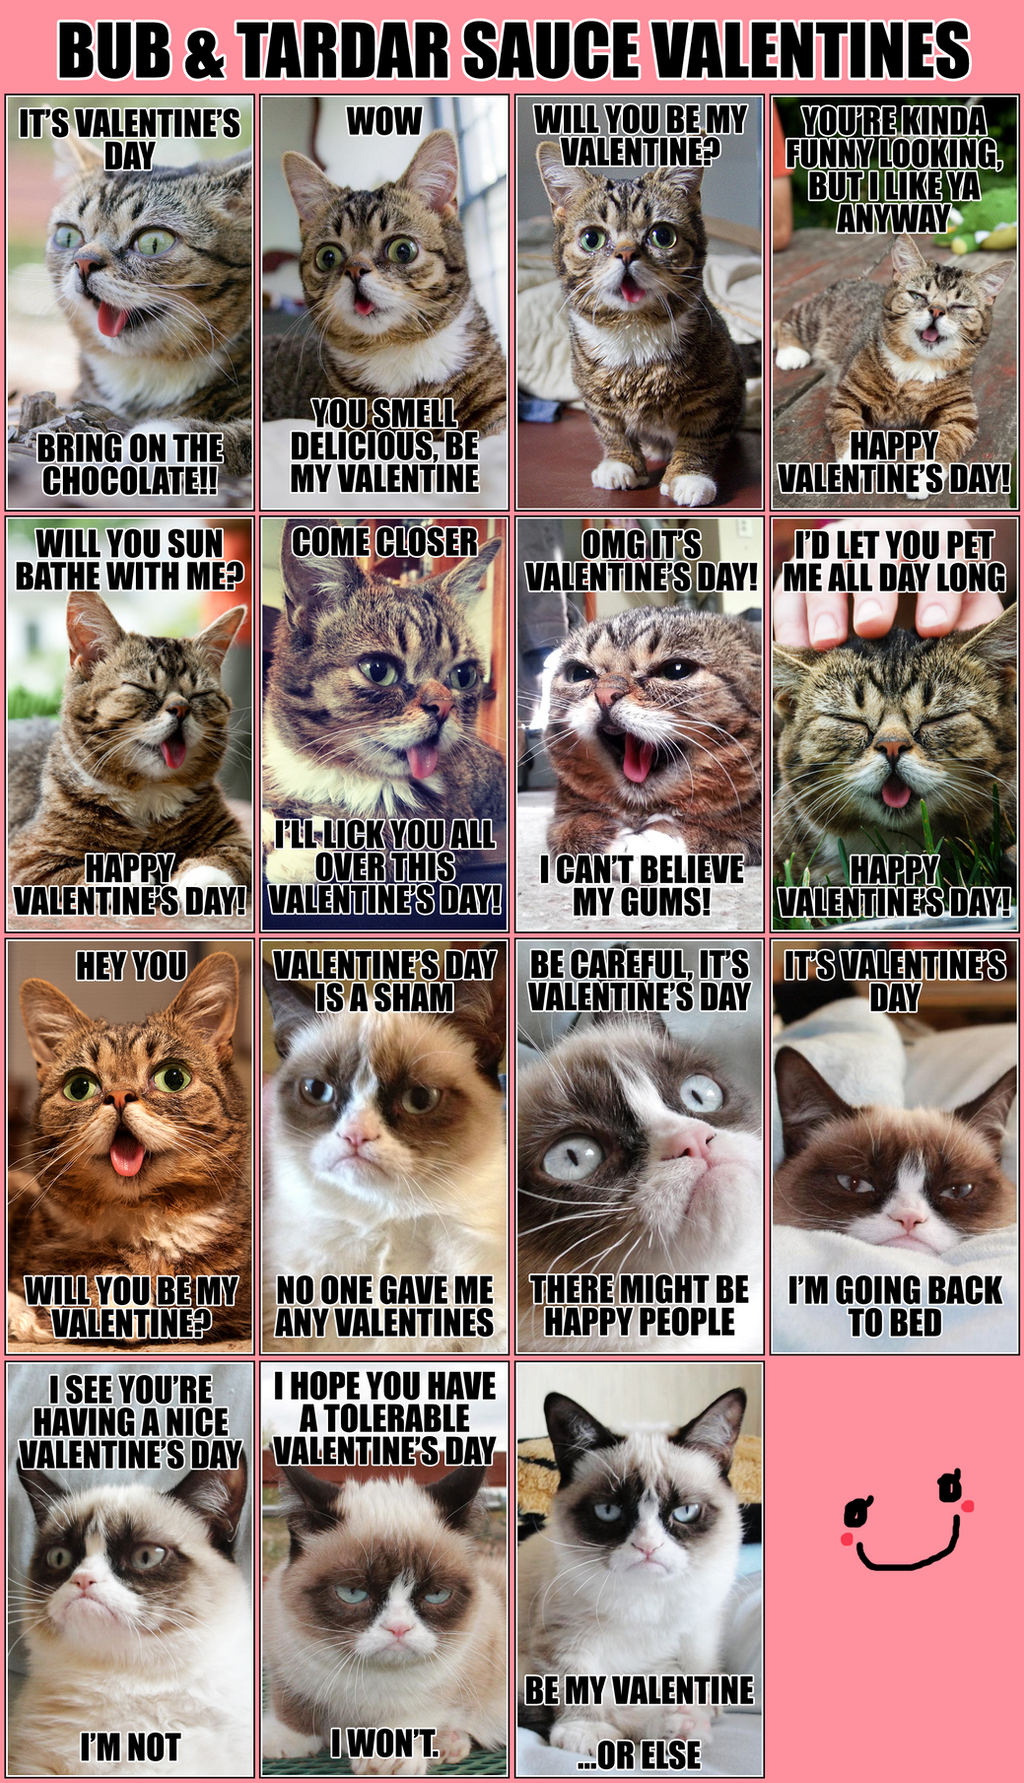 hellohappycrafts bub and tardar sauce grumpy cat valentines by hellohappycrafts - Grumpy Cat Valentine